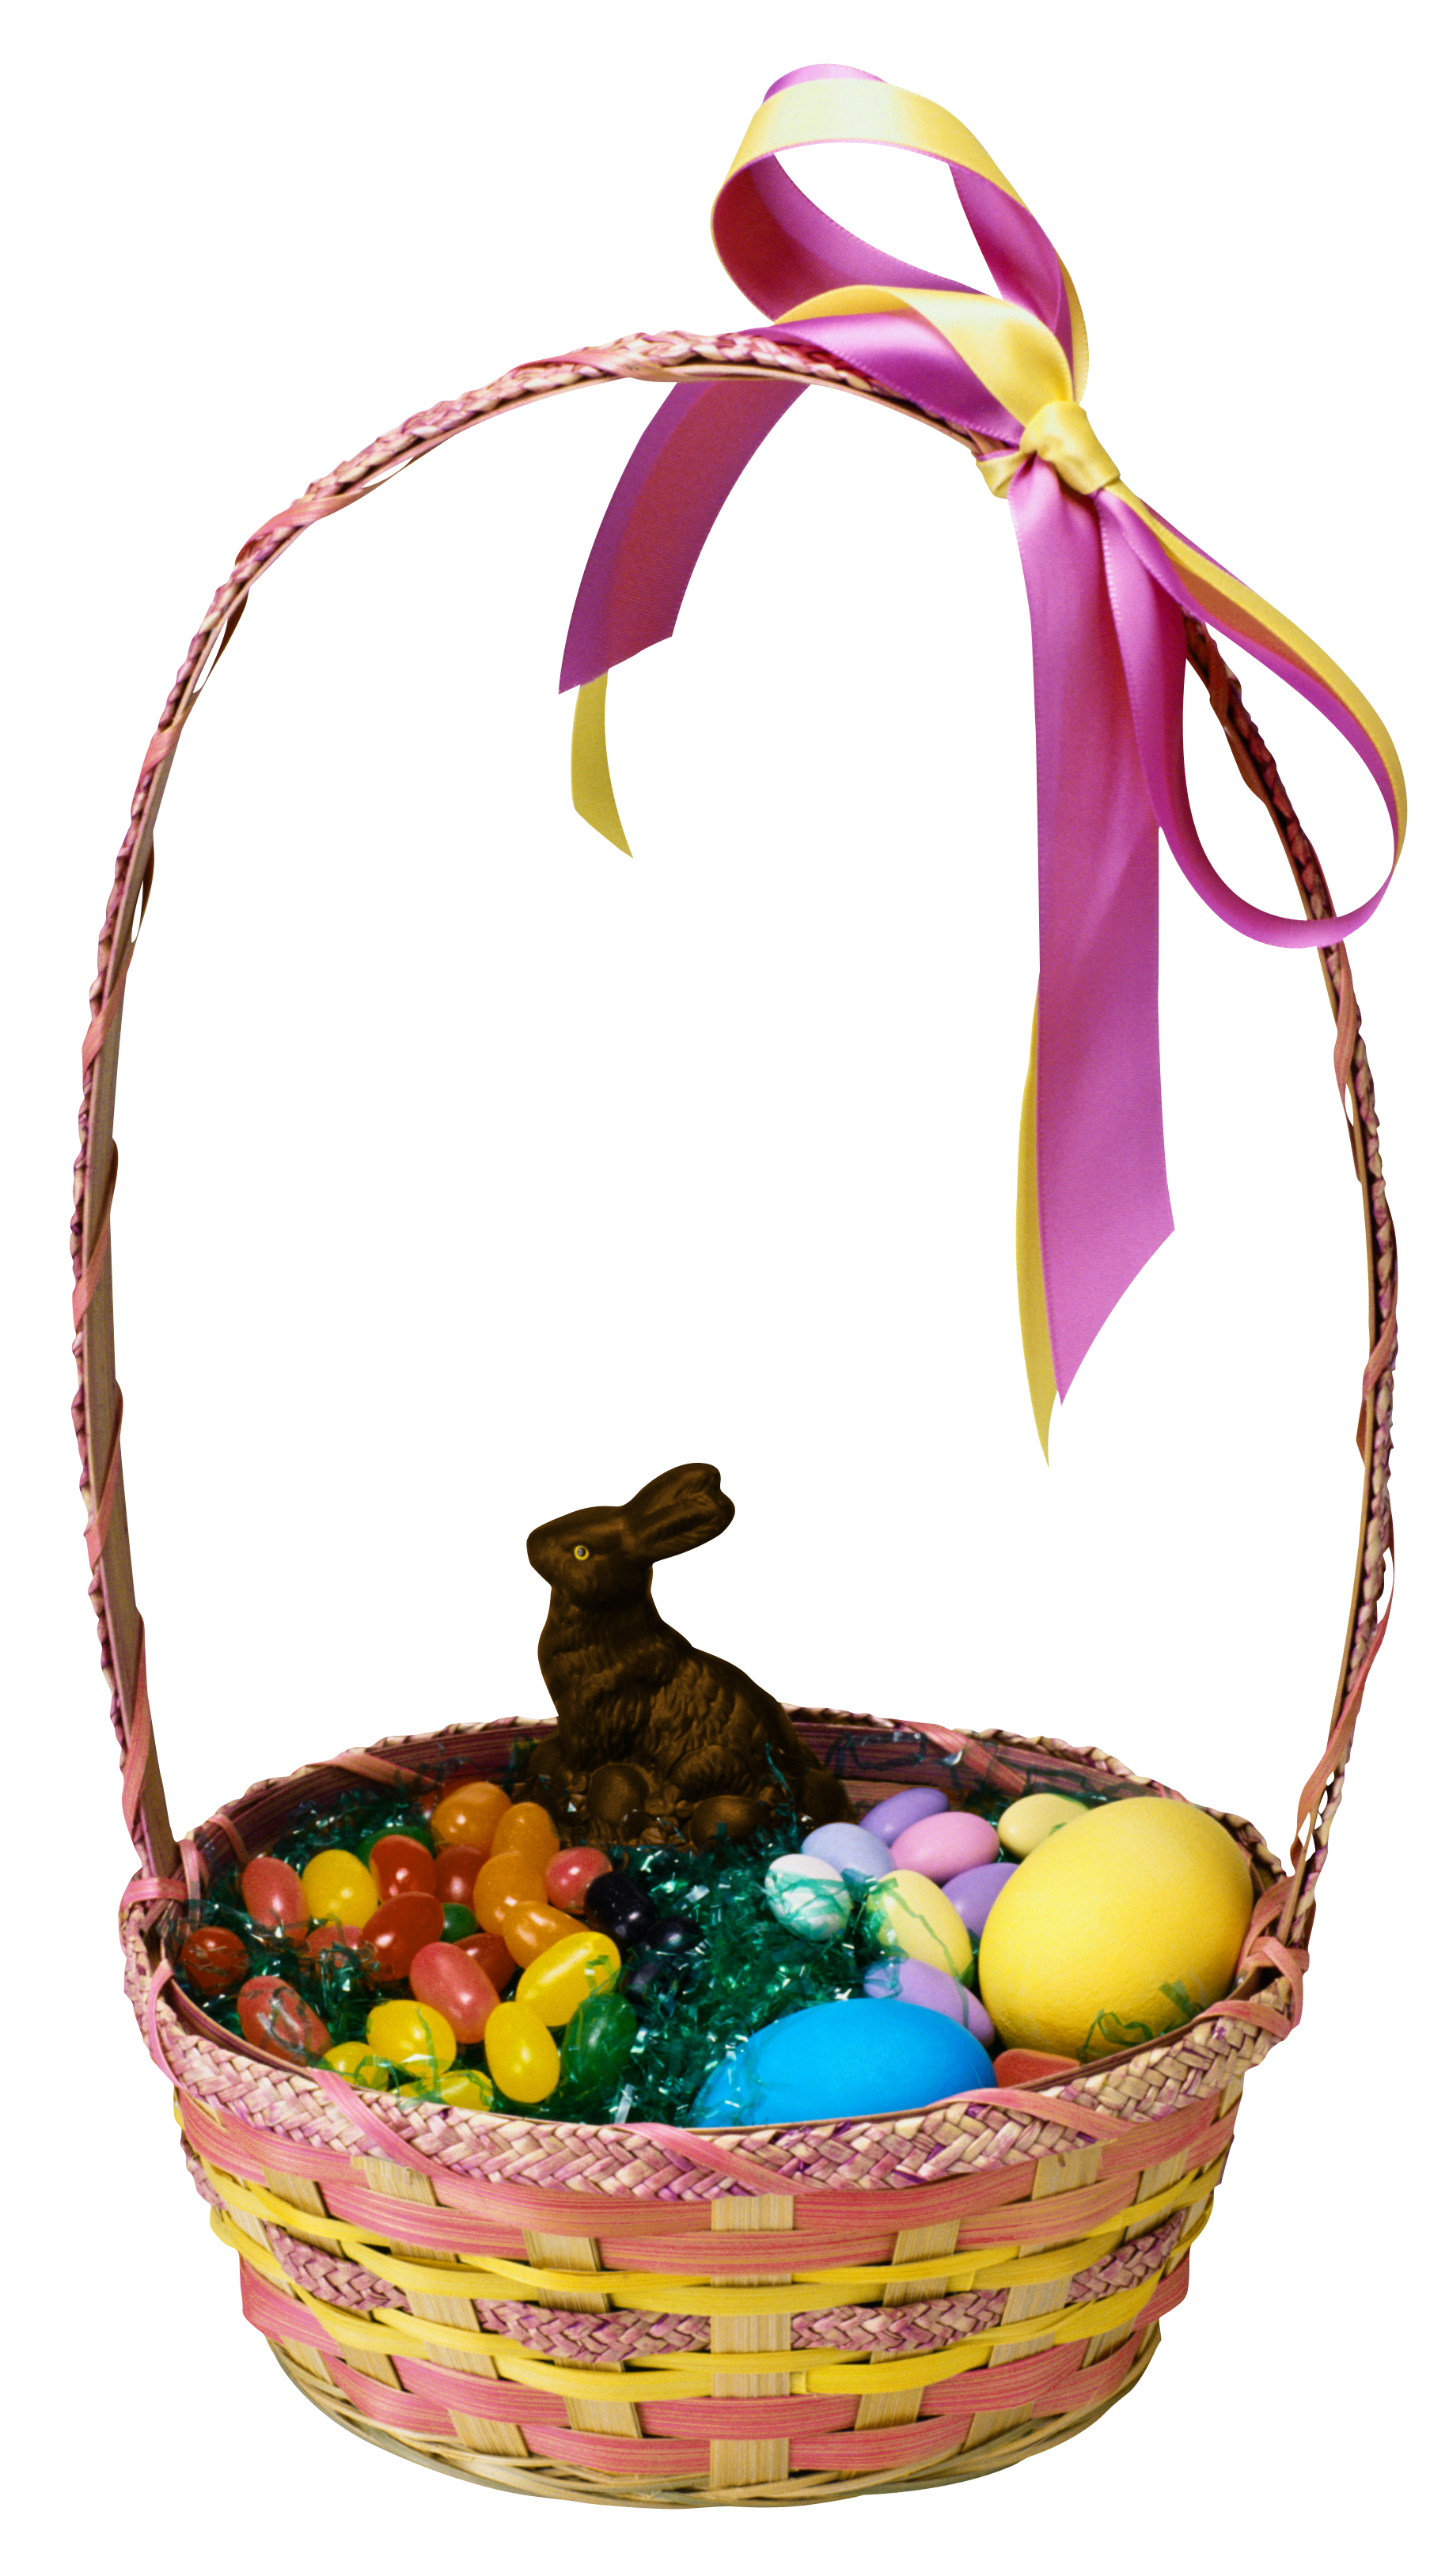 Grapes clipart basket, Grapes basket Transparent FREE for ...